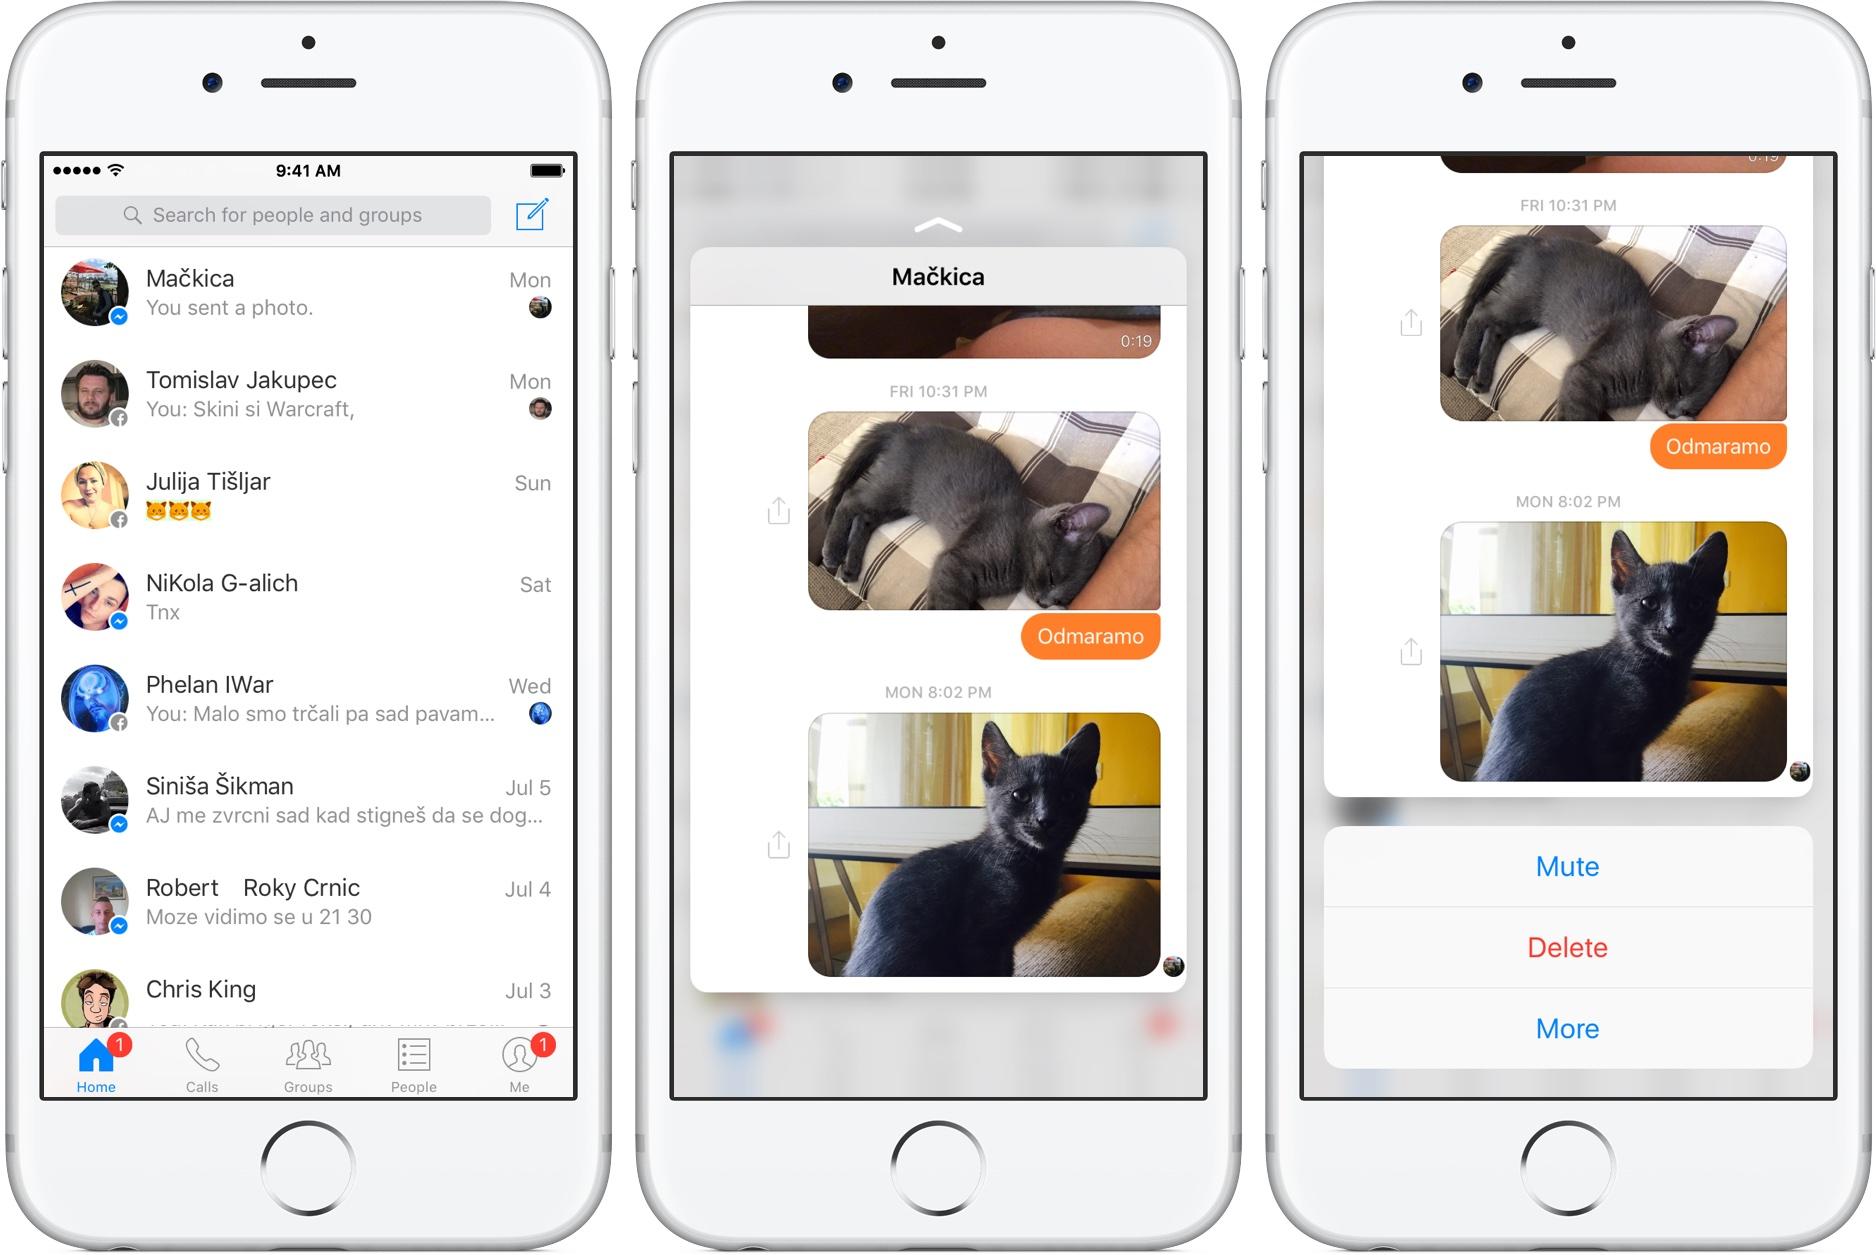 Captura de pantalla 002 del iPhone FAcebook Messenger 3D Touch silver